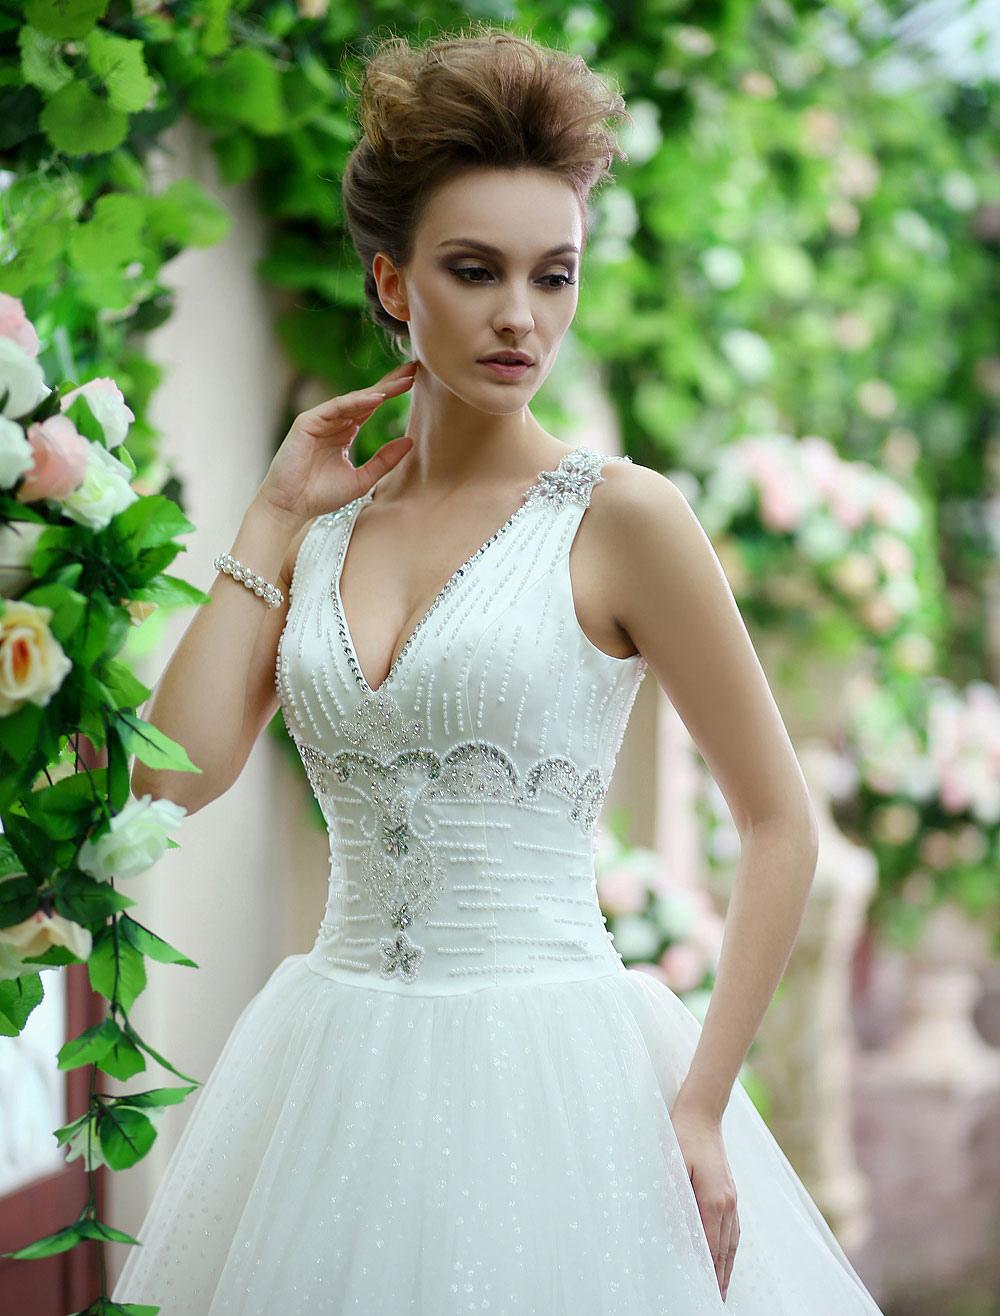 Ivory A-line V-Neck Rhinestone Court Train Tulle Bridal Wedding Gown  Milanoo